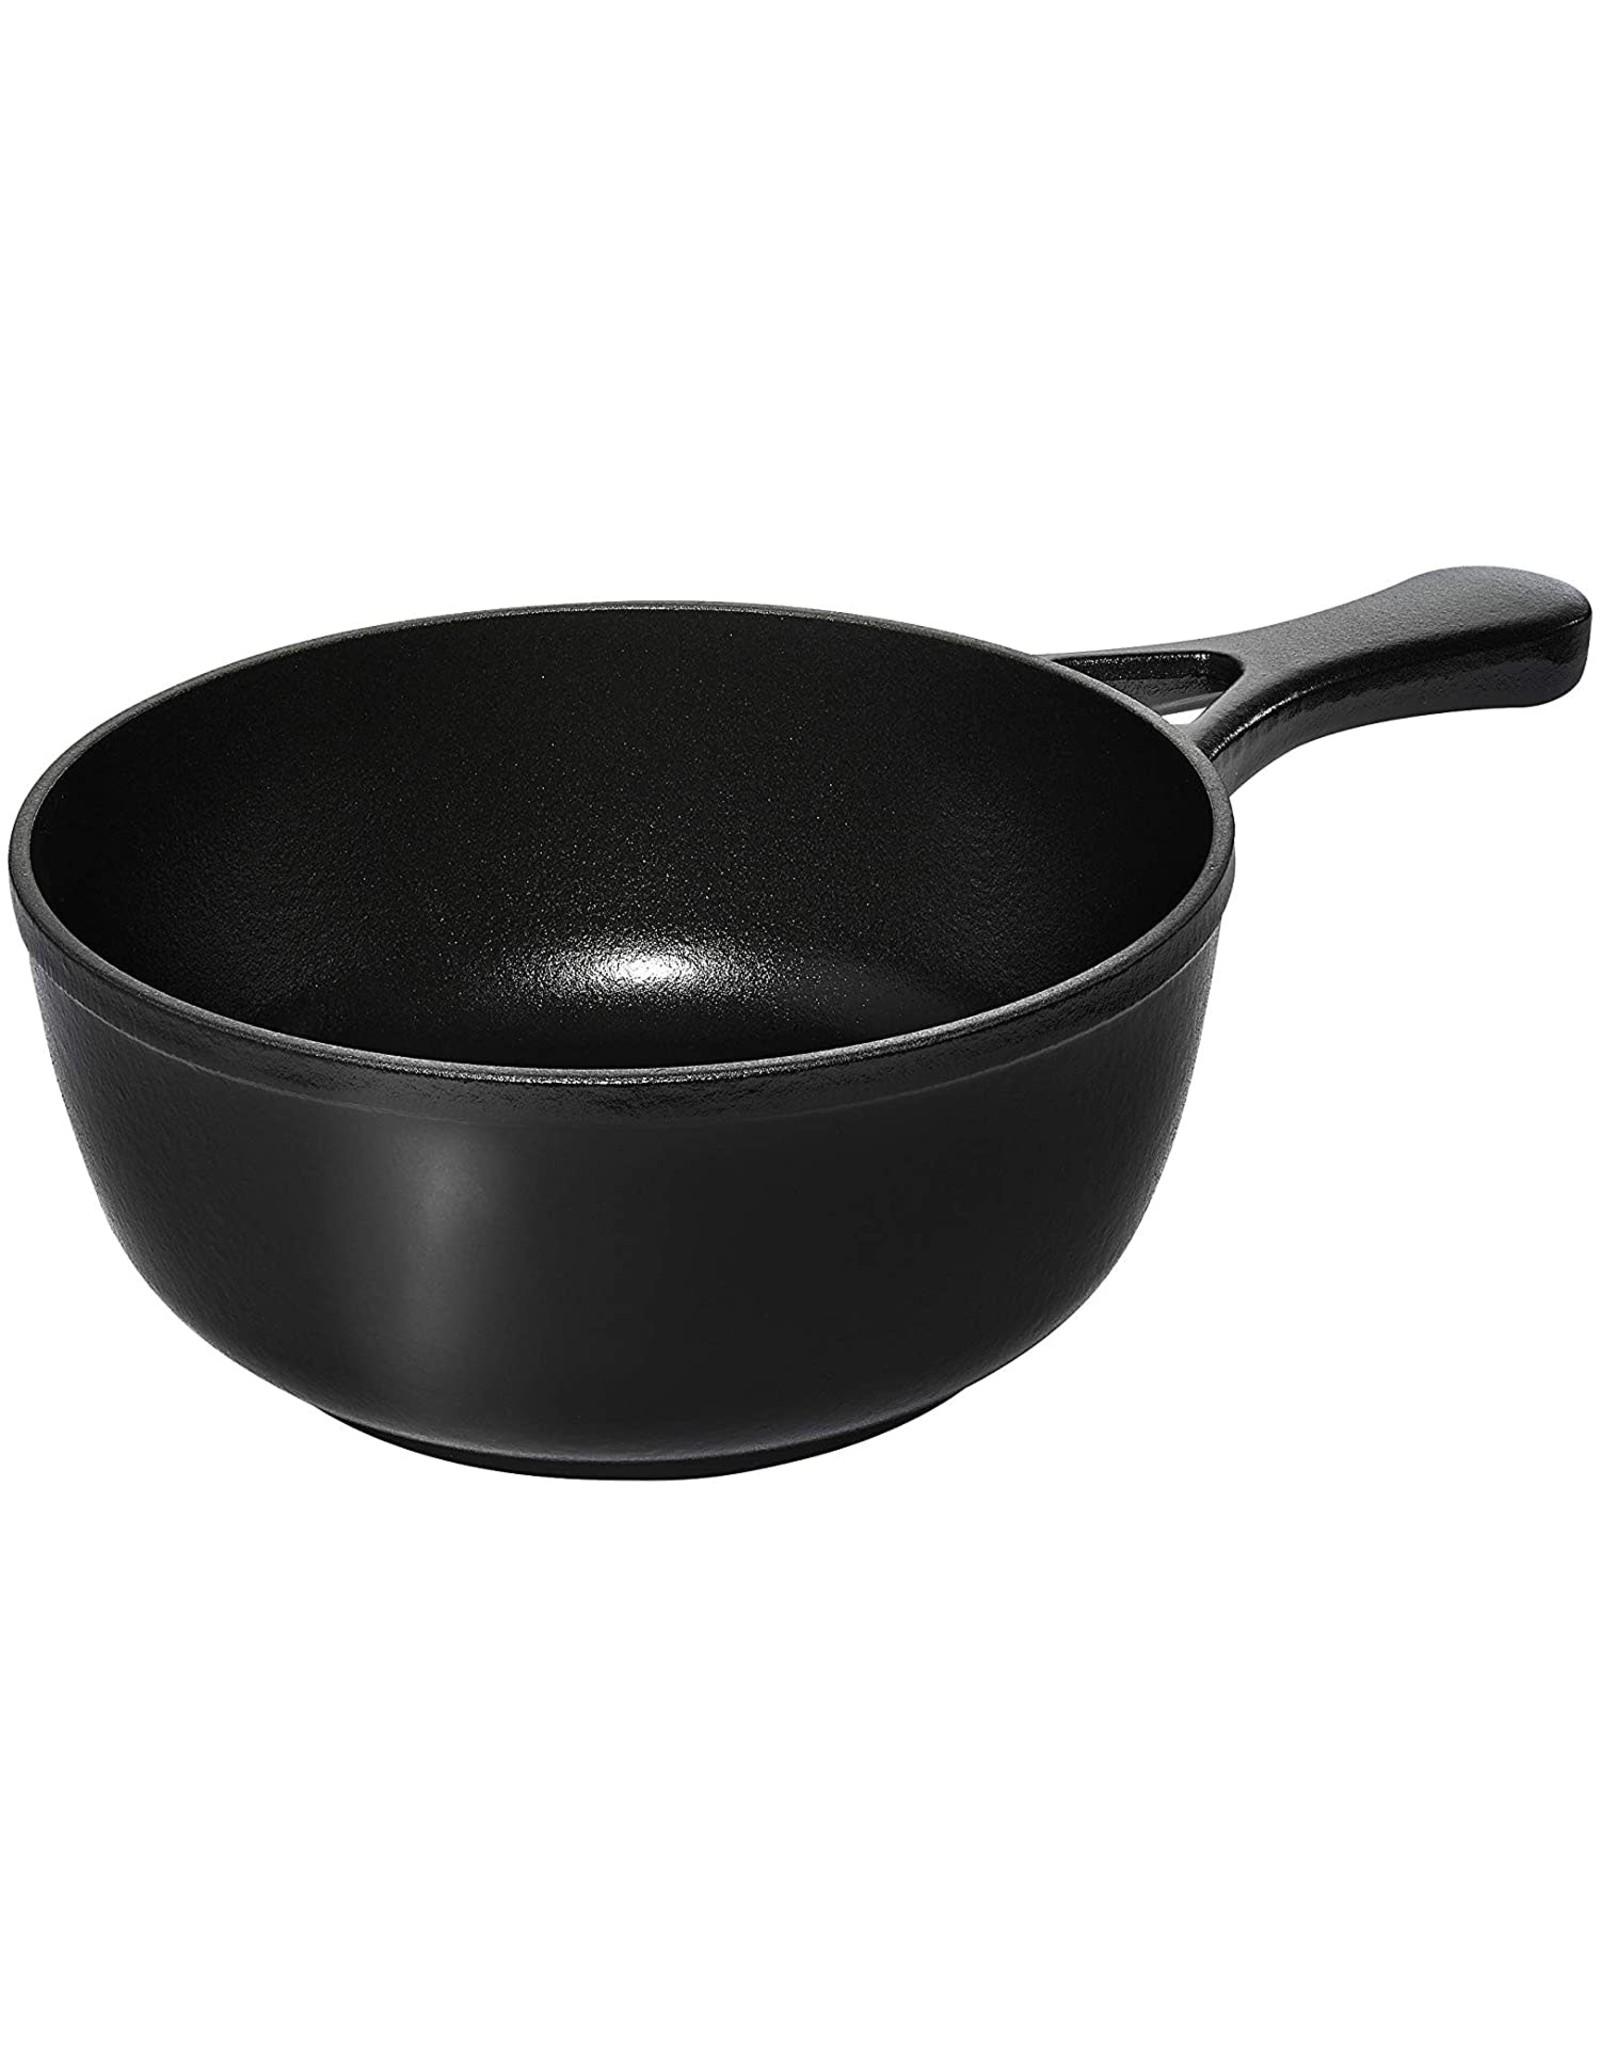 Chasseur Fonduepan 20cm 2L zwart